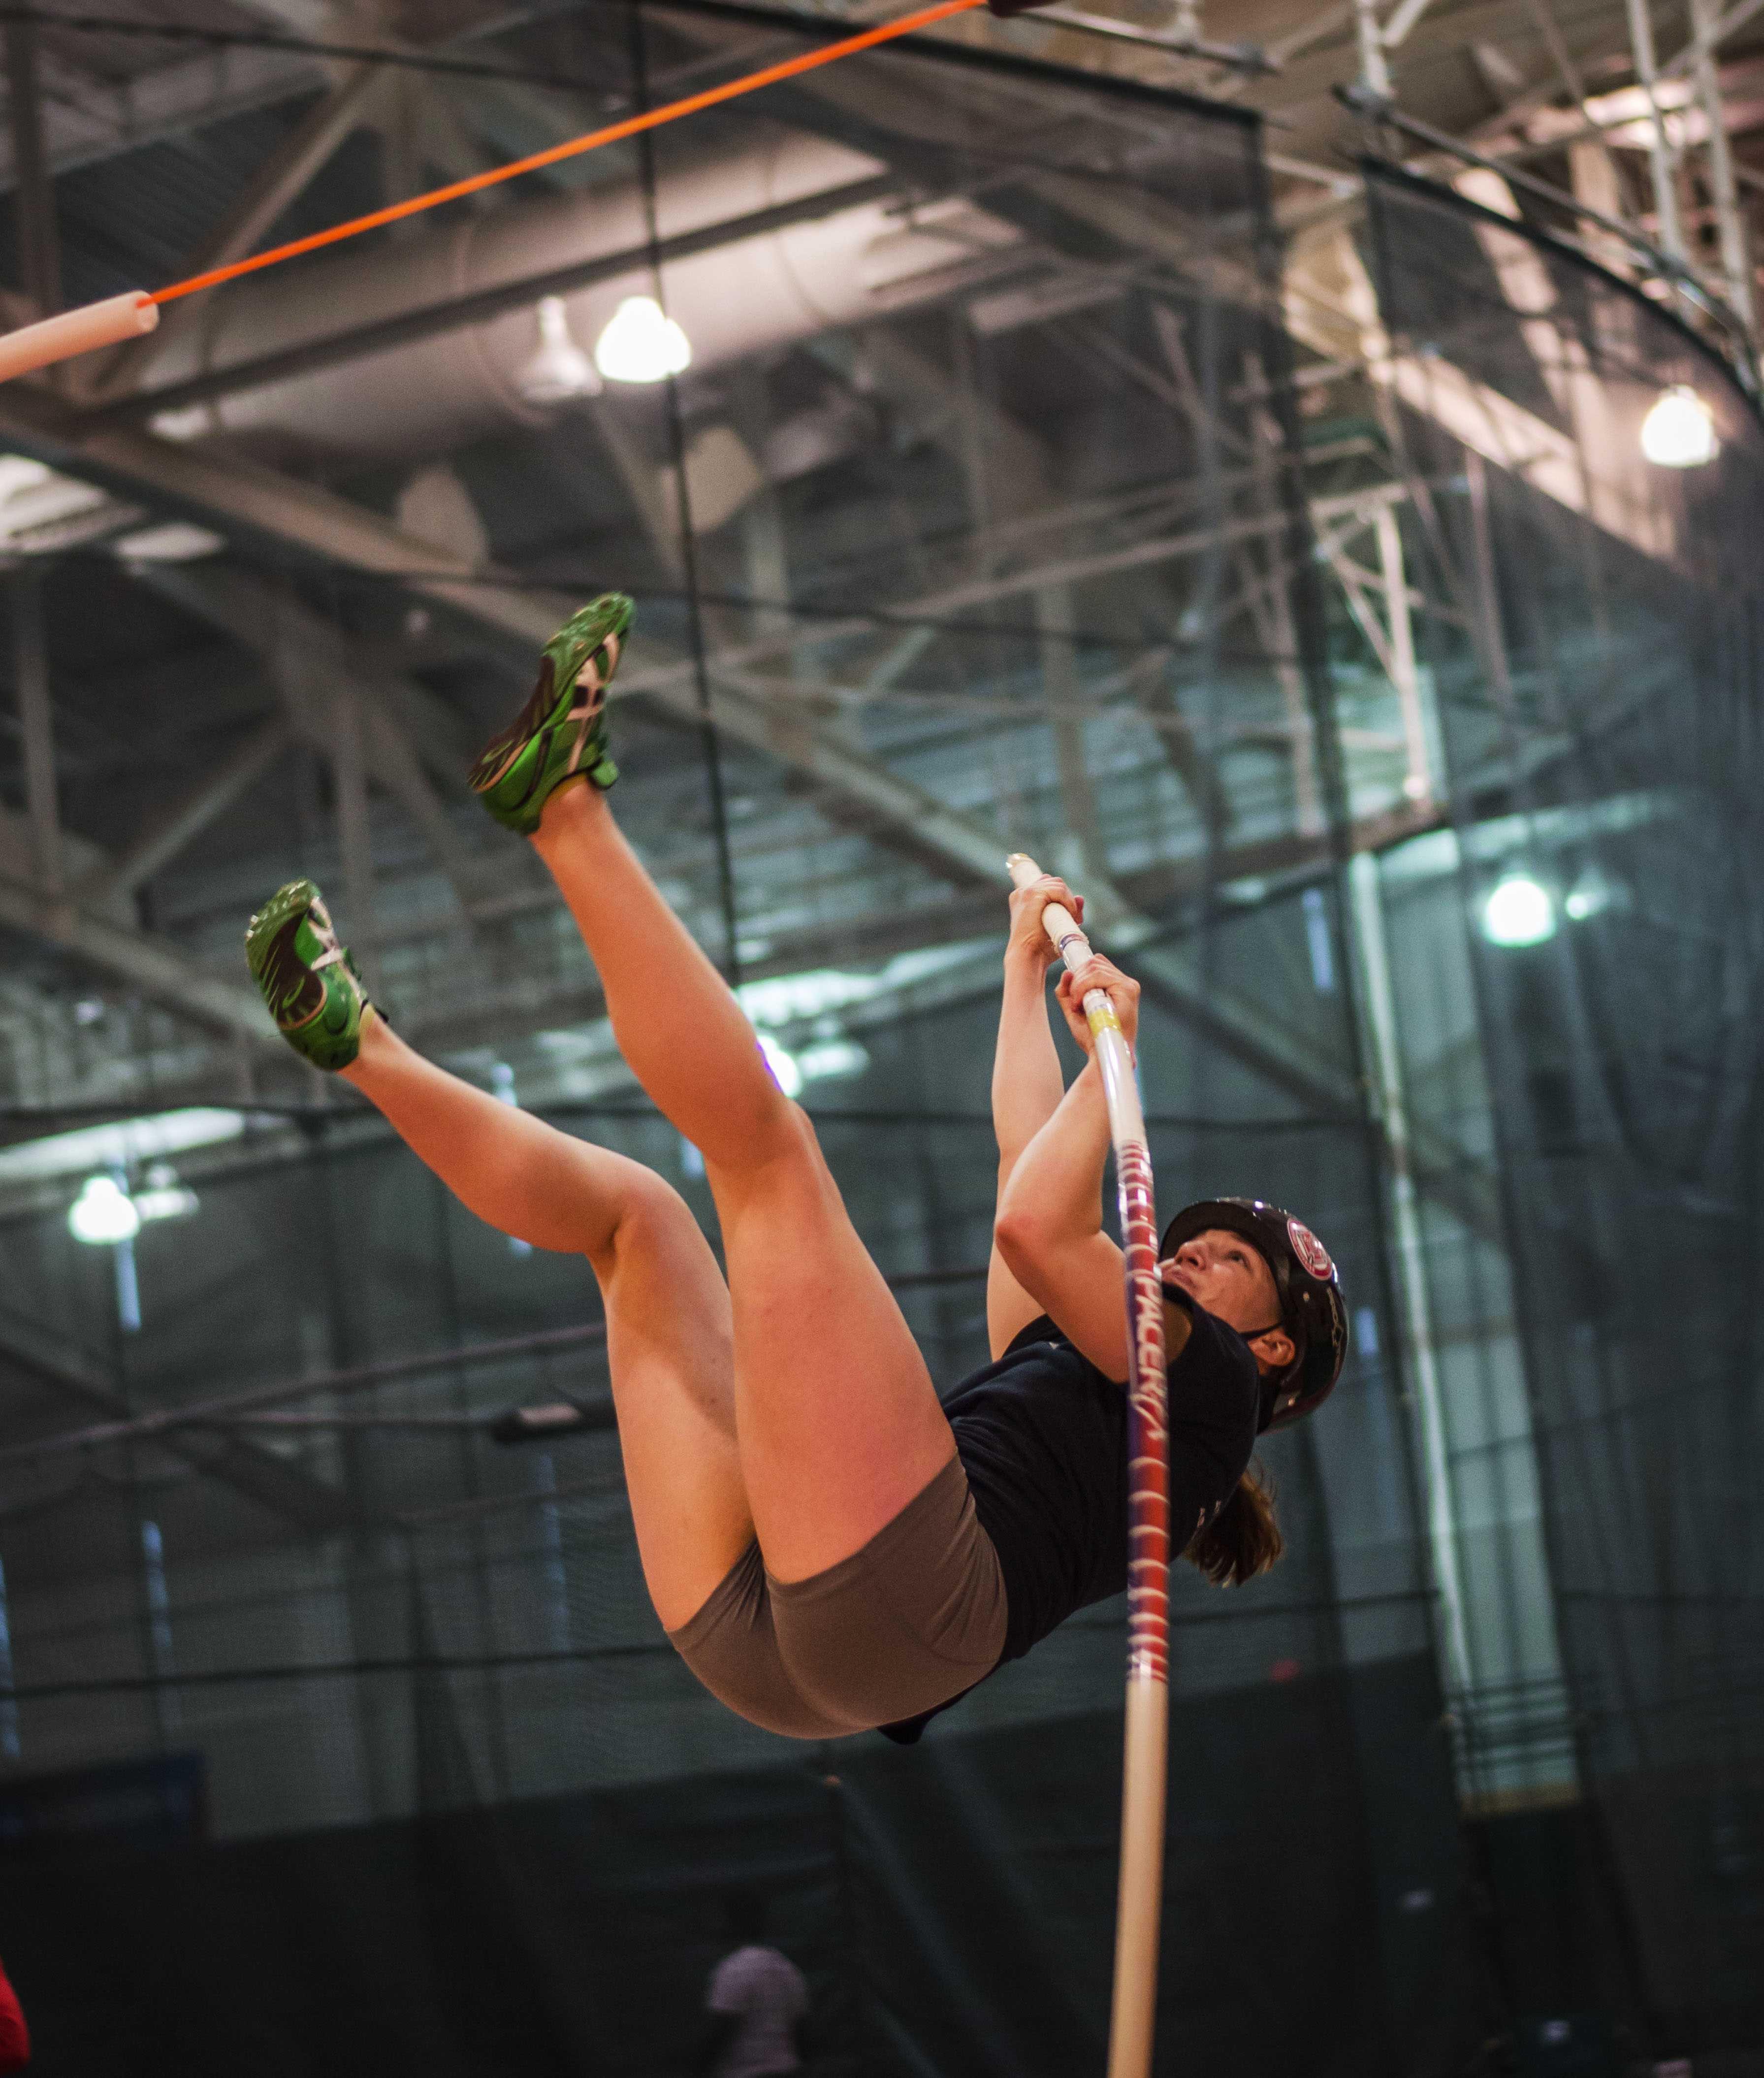 Athena Carlson '15 pole vaults at practice this week. Photo by John Brady